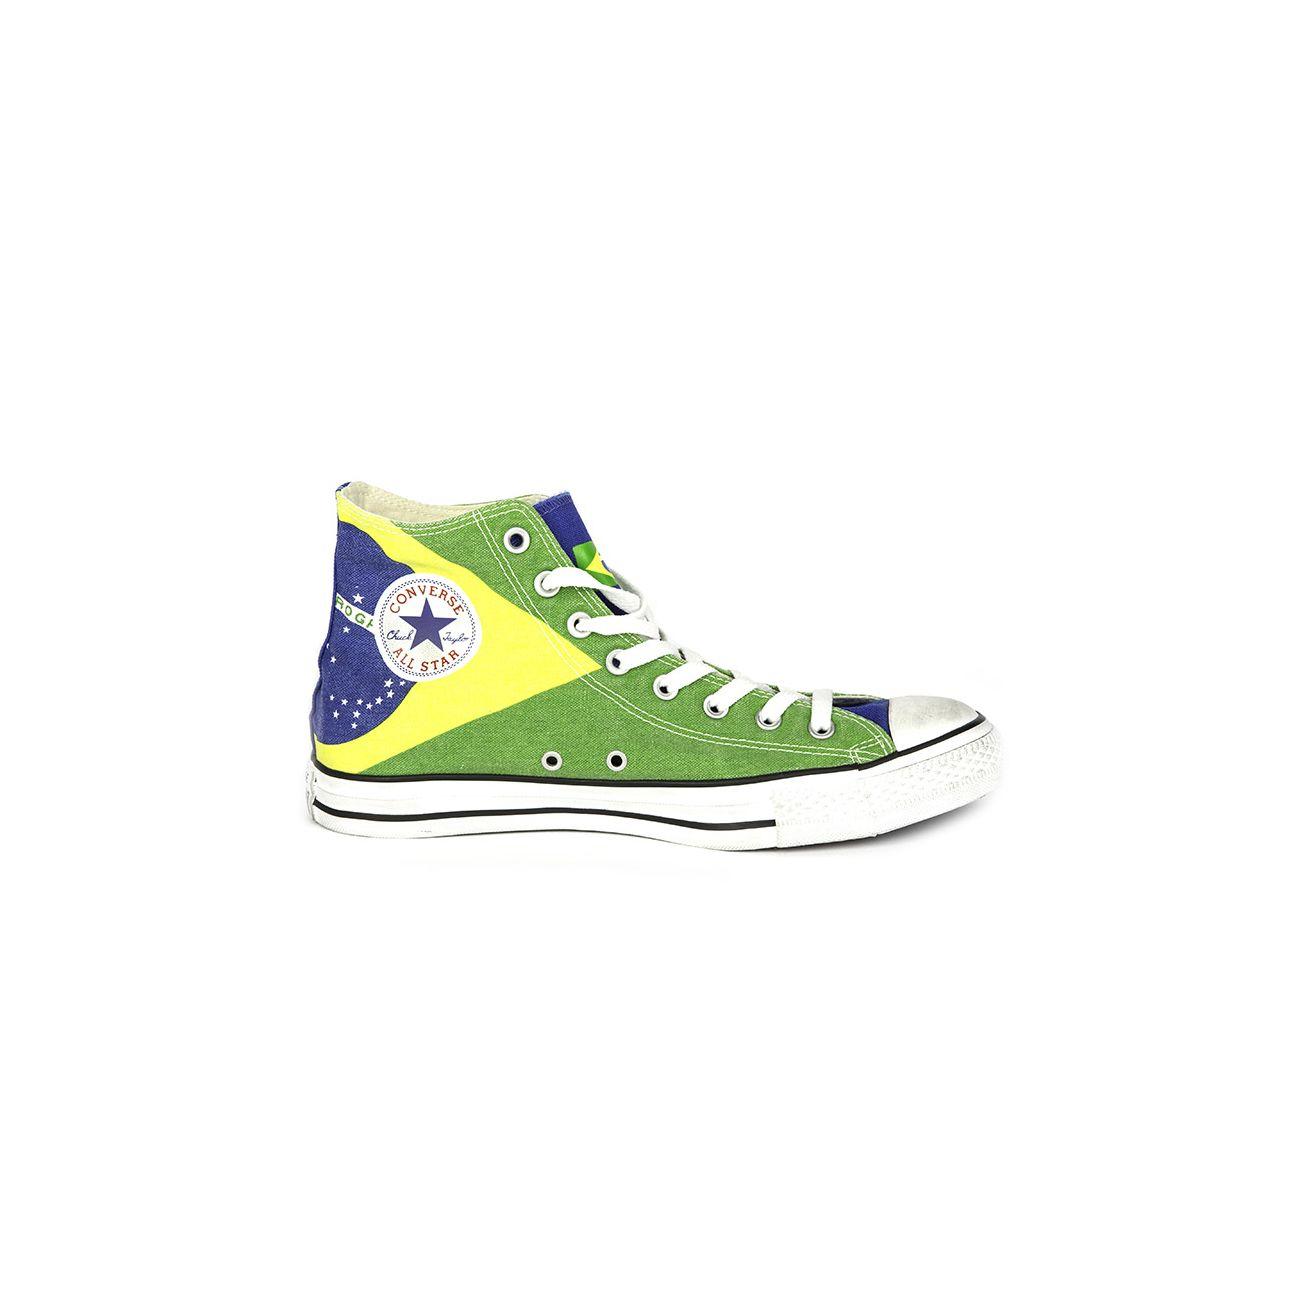 CONVERSE SNEAKERS ALL STAR HI GRAPHICS BRASIL FLAG | Mascheroni ...